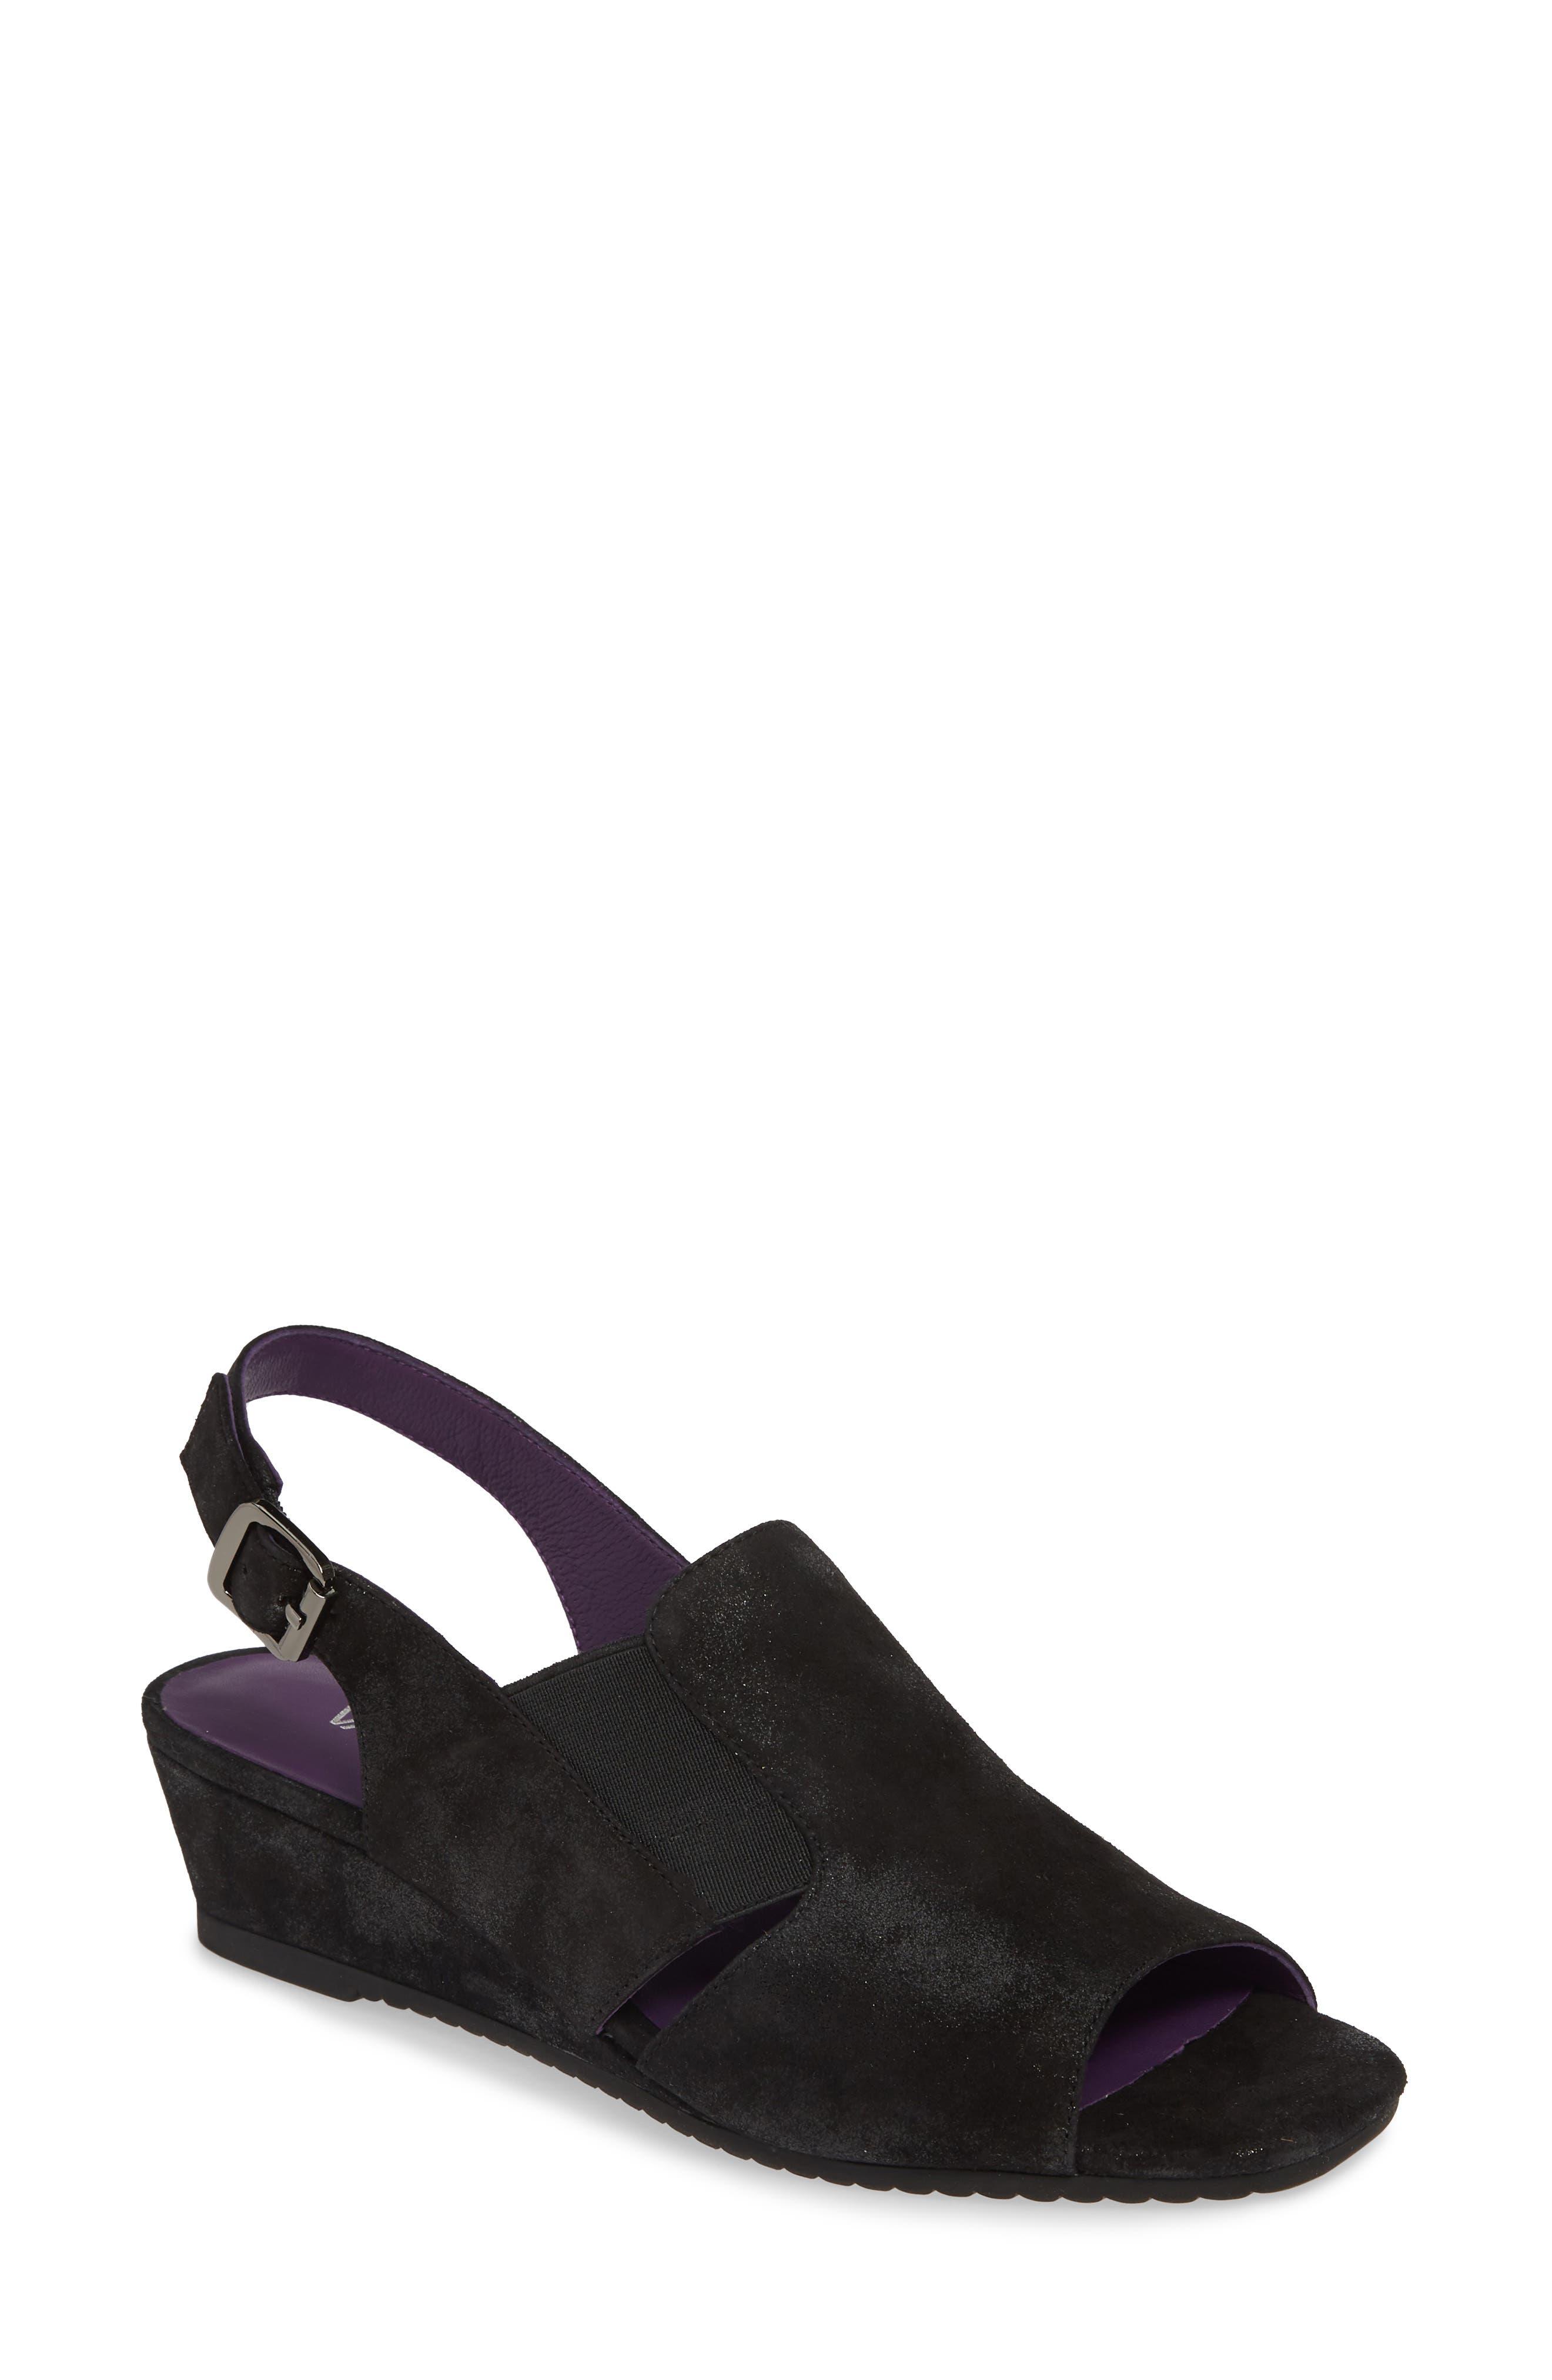 Vaneli Flory Slingback Sandal- Black